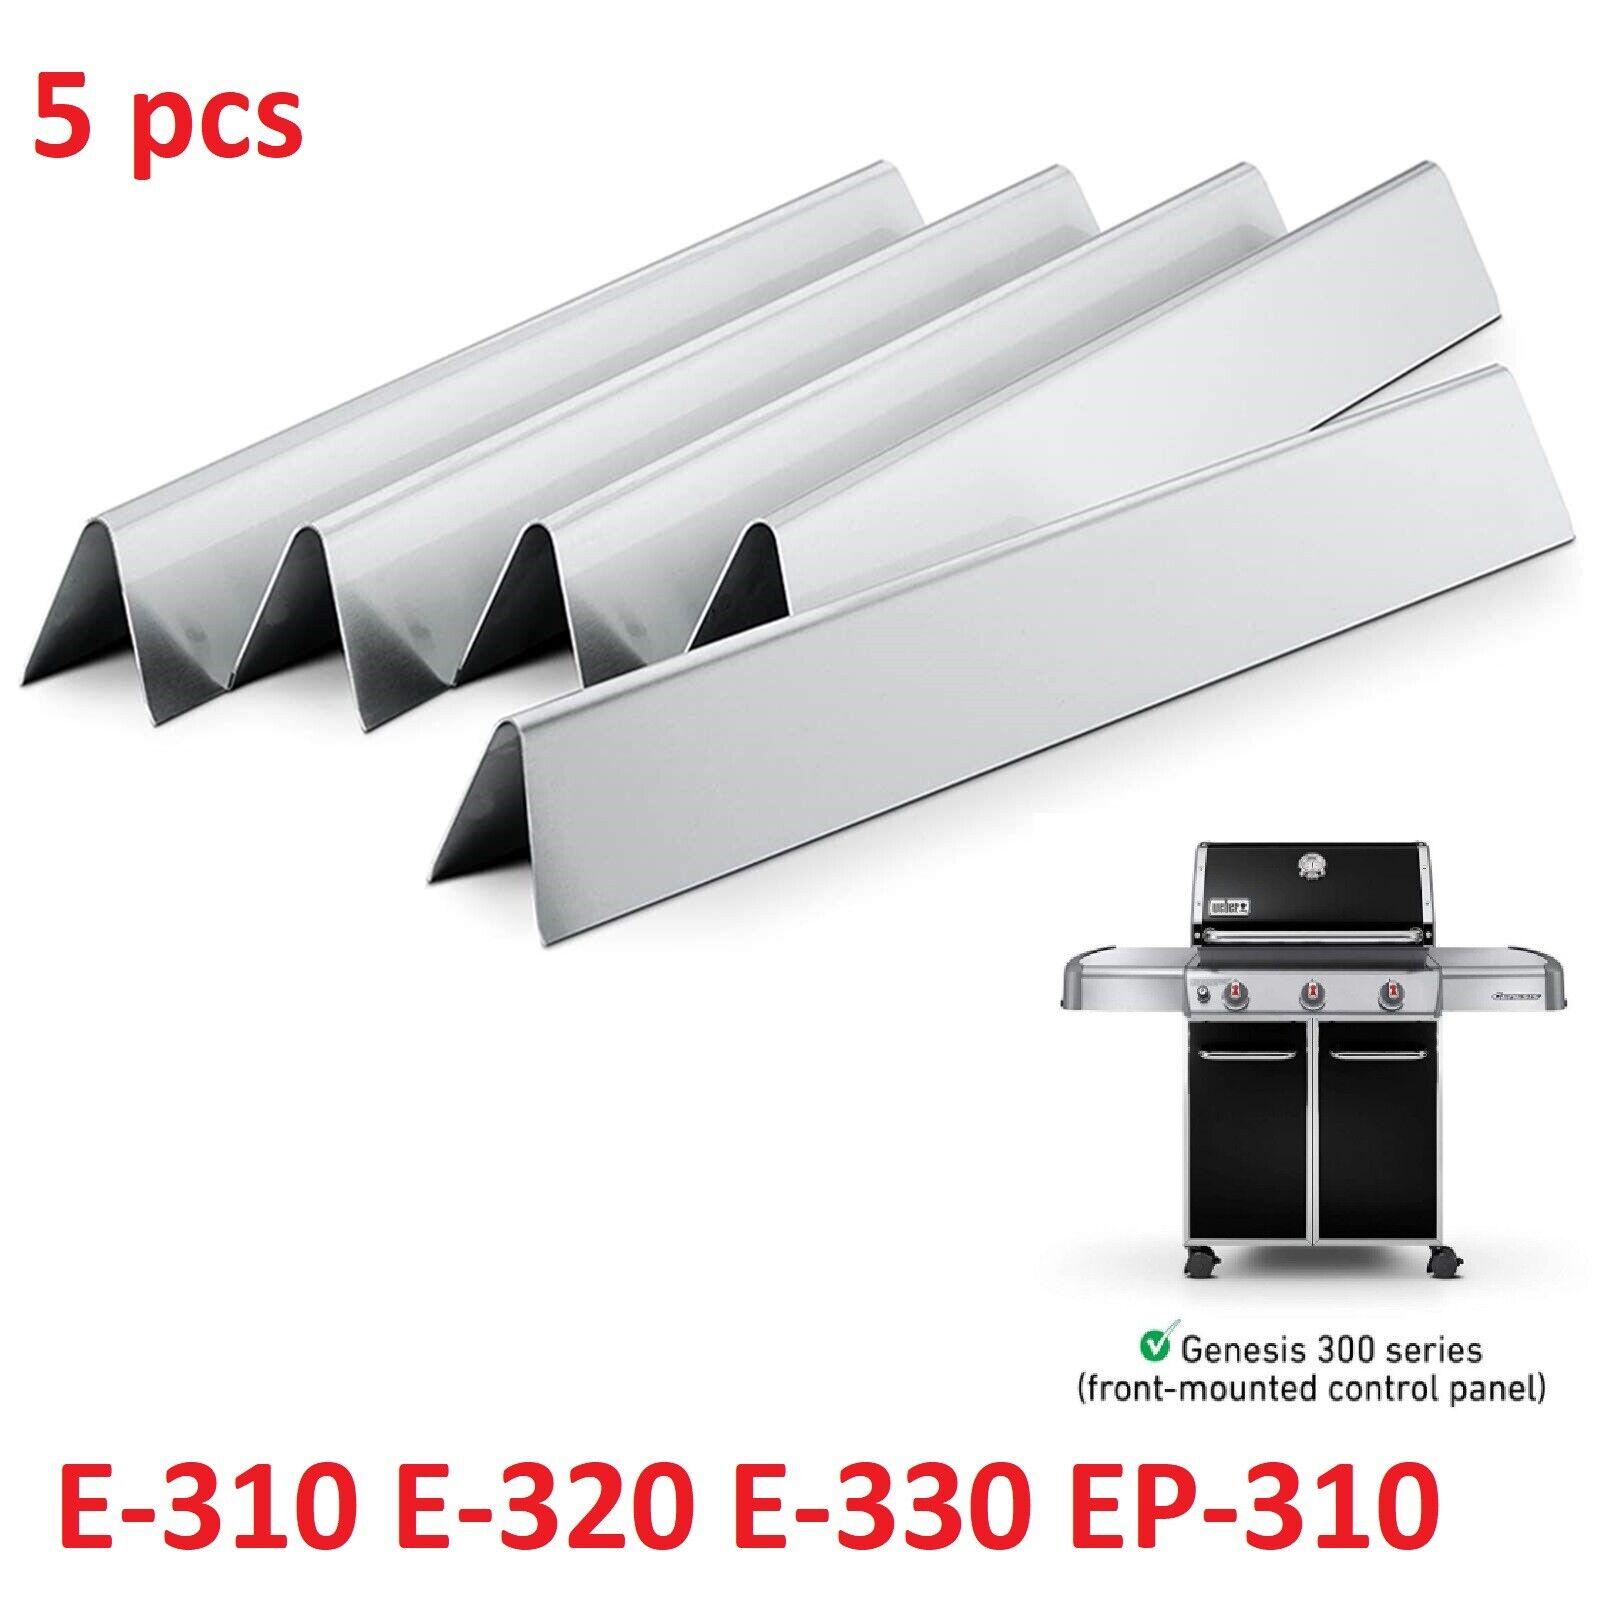 Weber Genesis S 330 Lp Gas Grill Stainless Steel For Sale Online Ebay